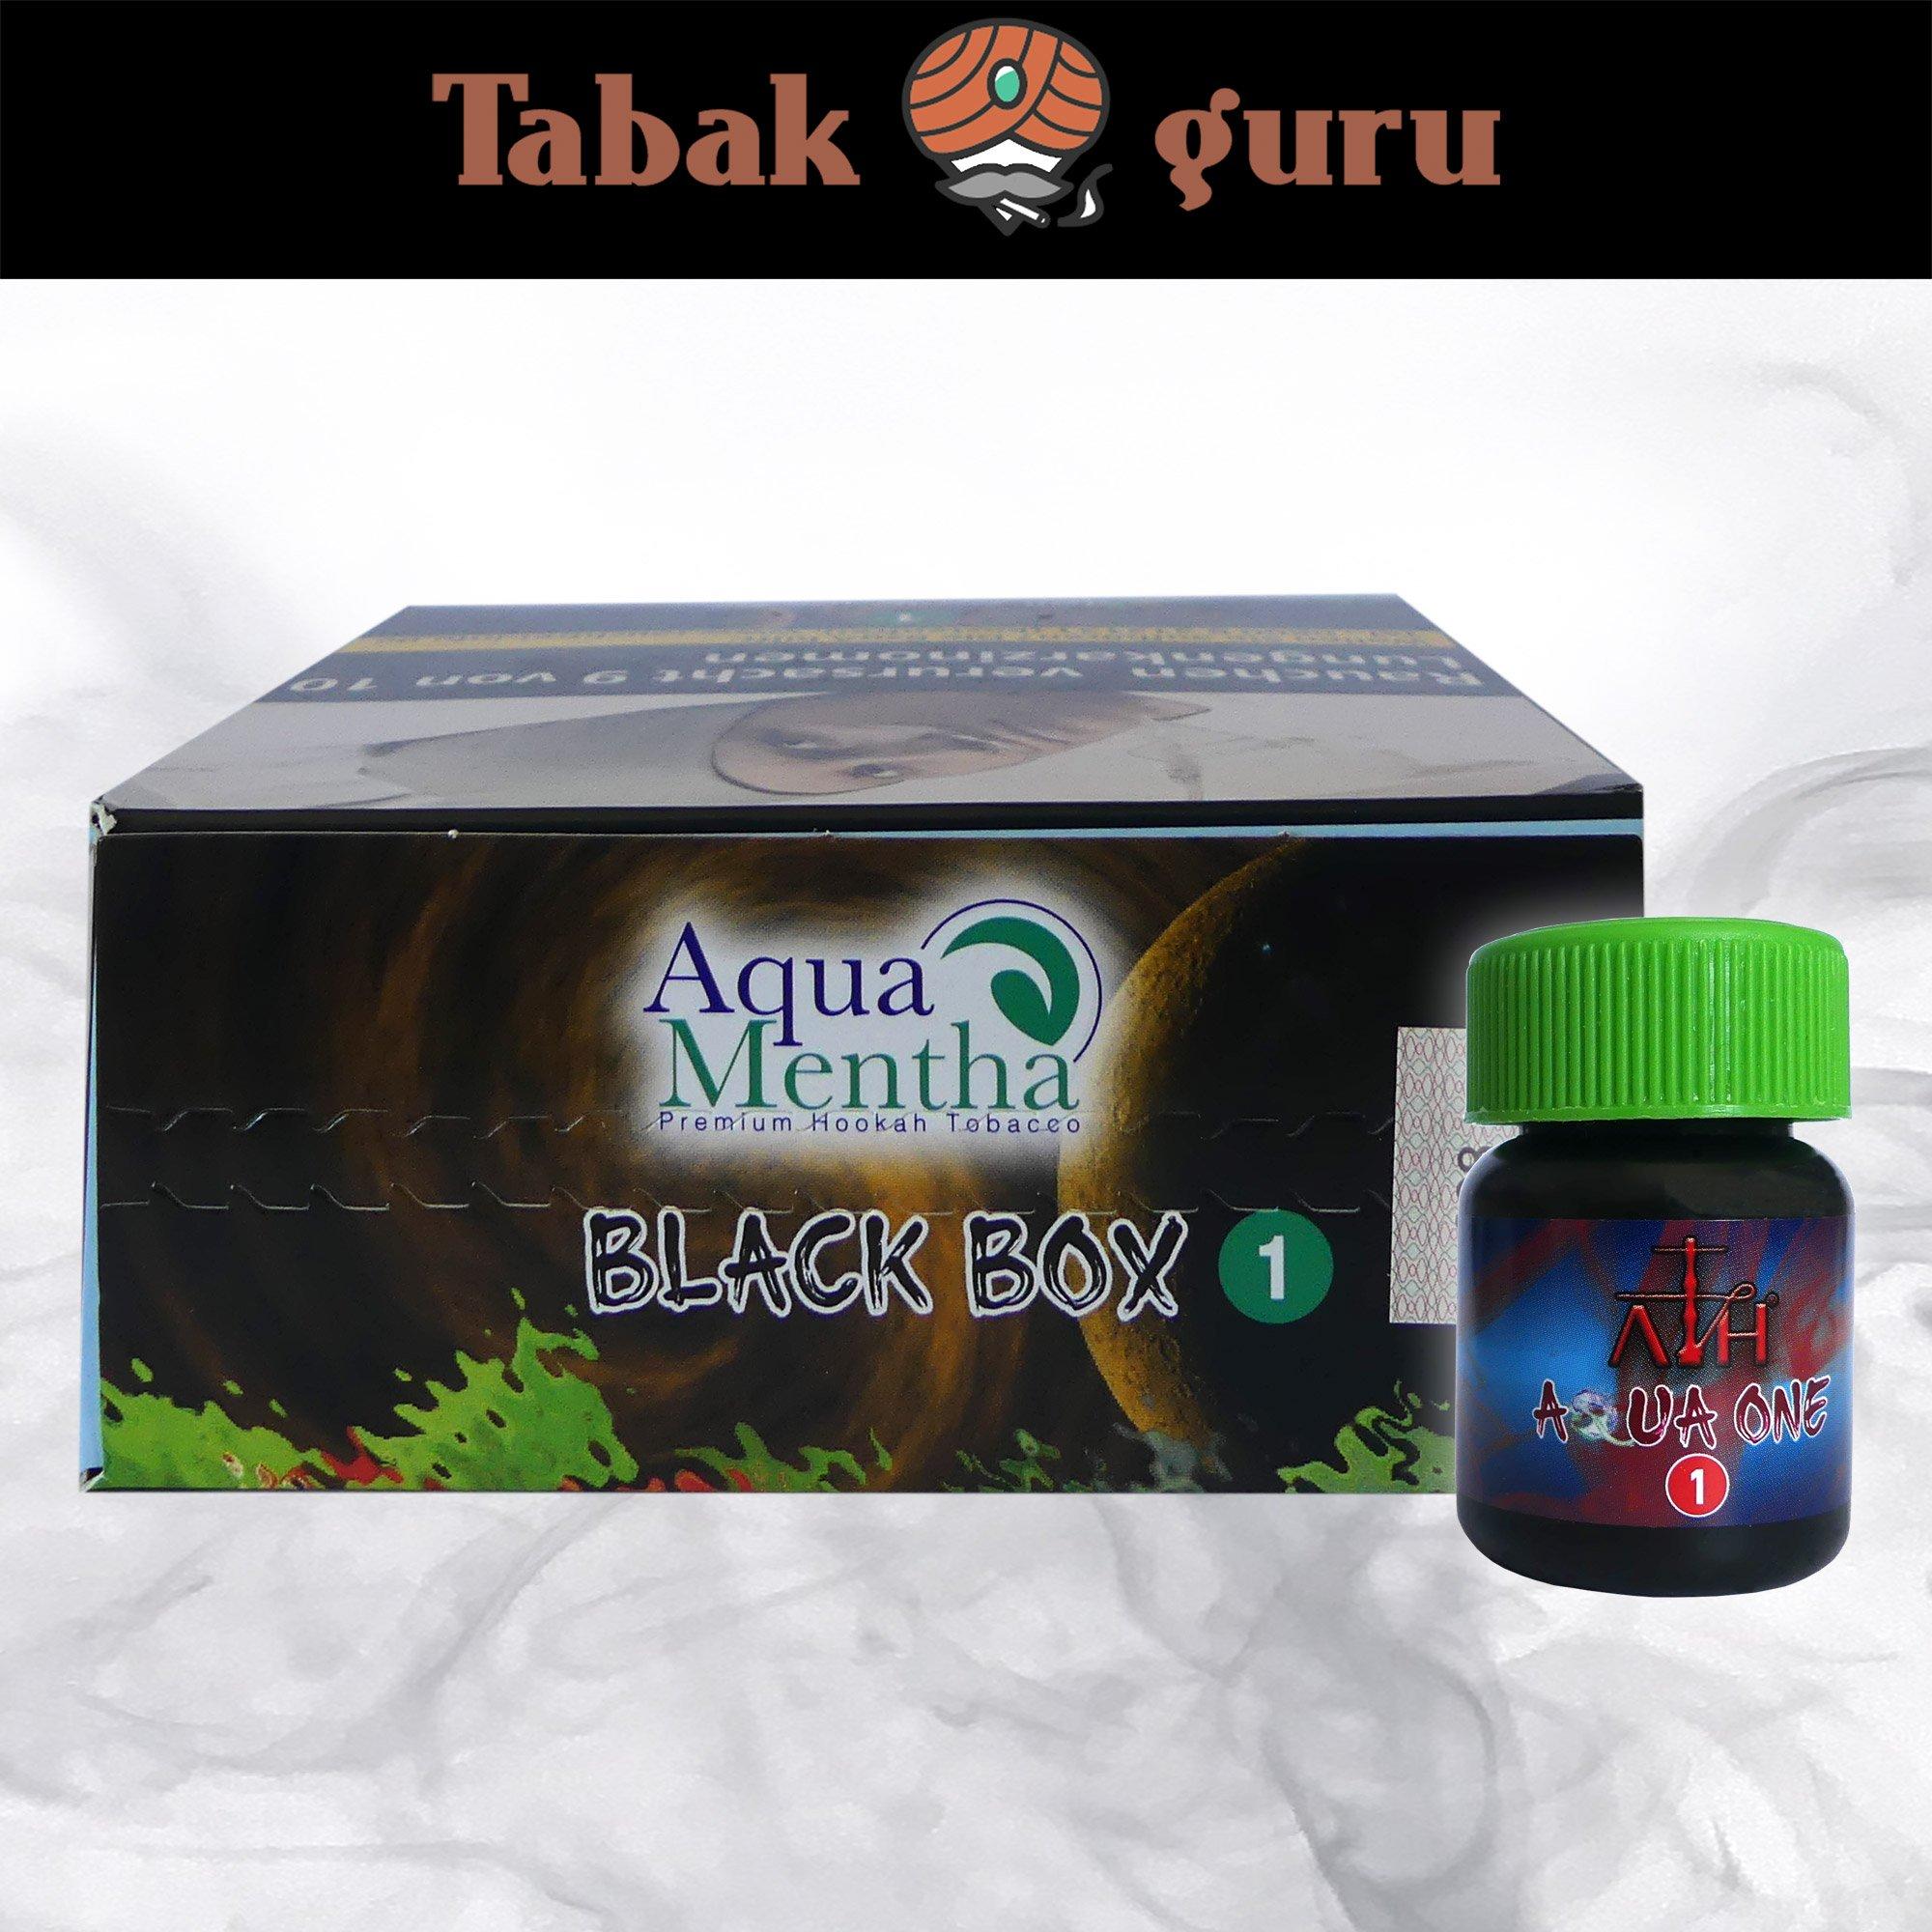 Aqua Mentha BLACK BOX #1 200g Shisha Tabak + ATH Aqua One Mix